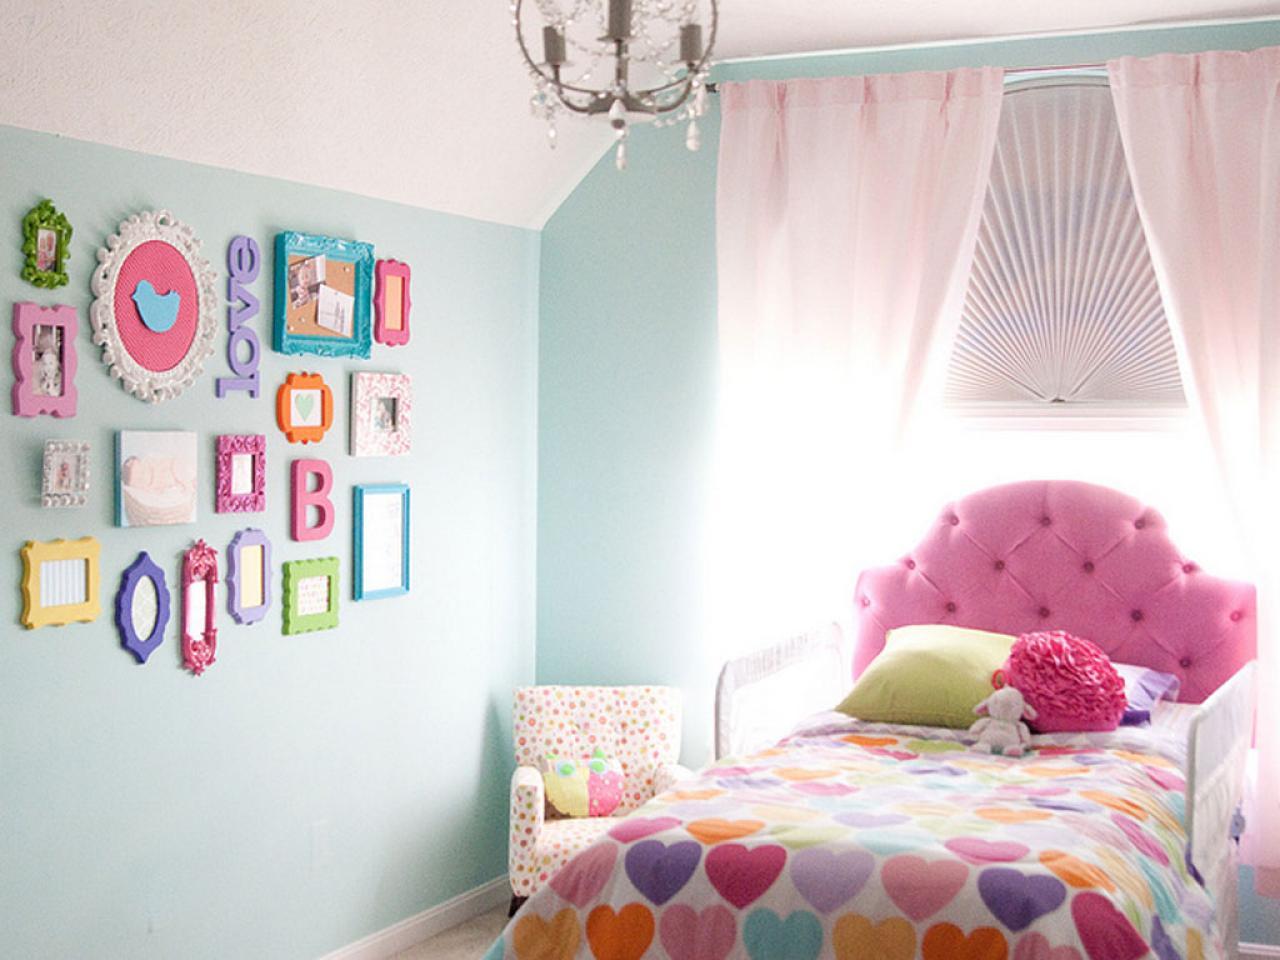 Декор комнаты своими руками для девочки